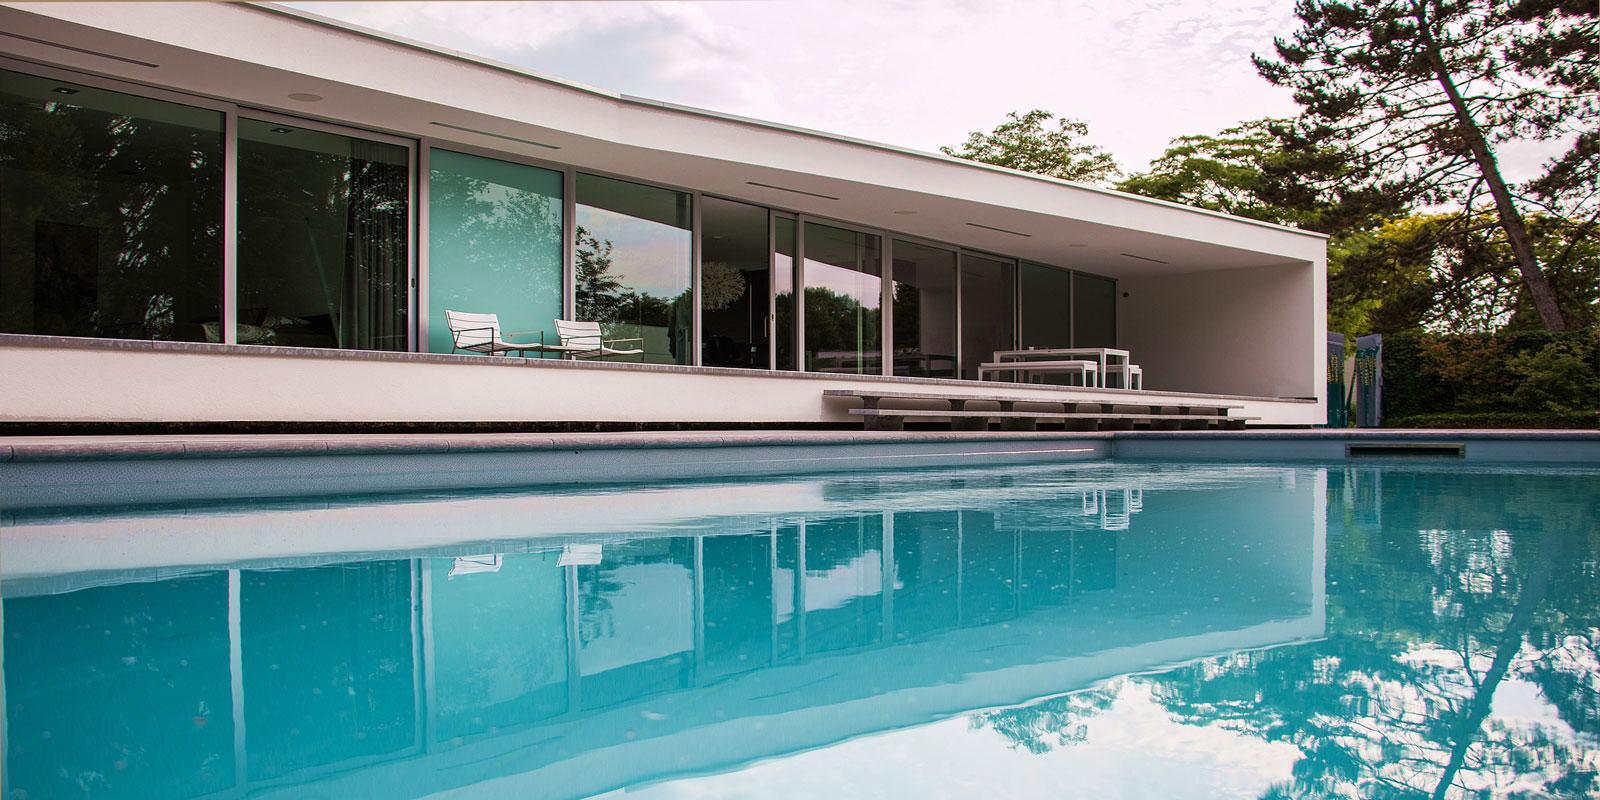 Zwevende villa | Lab32 architecten